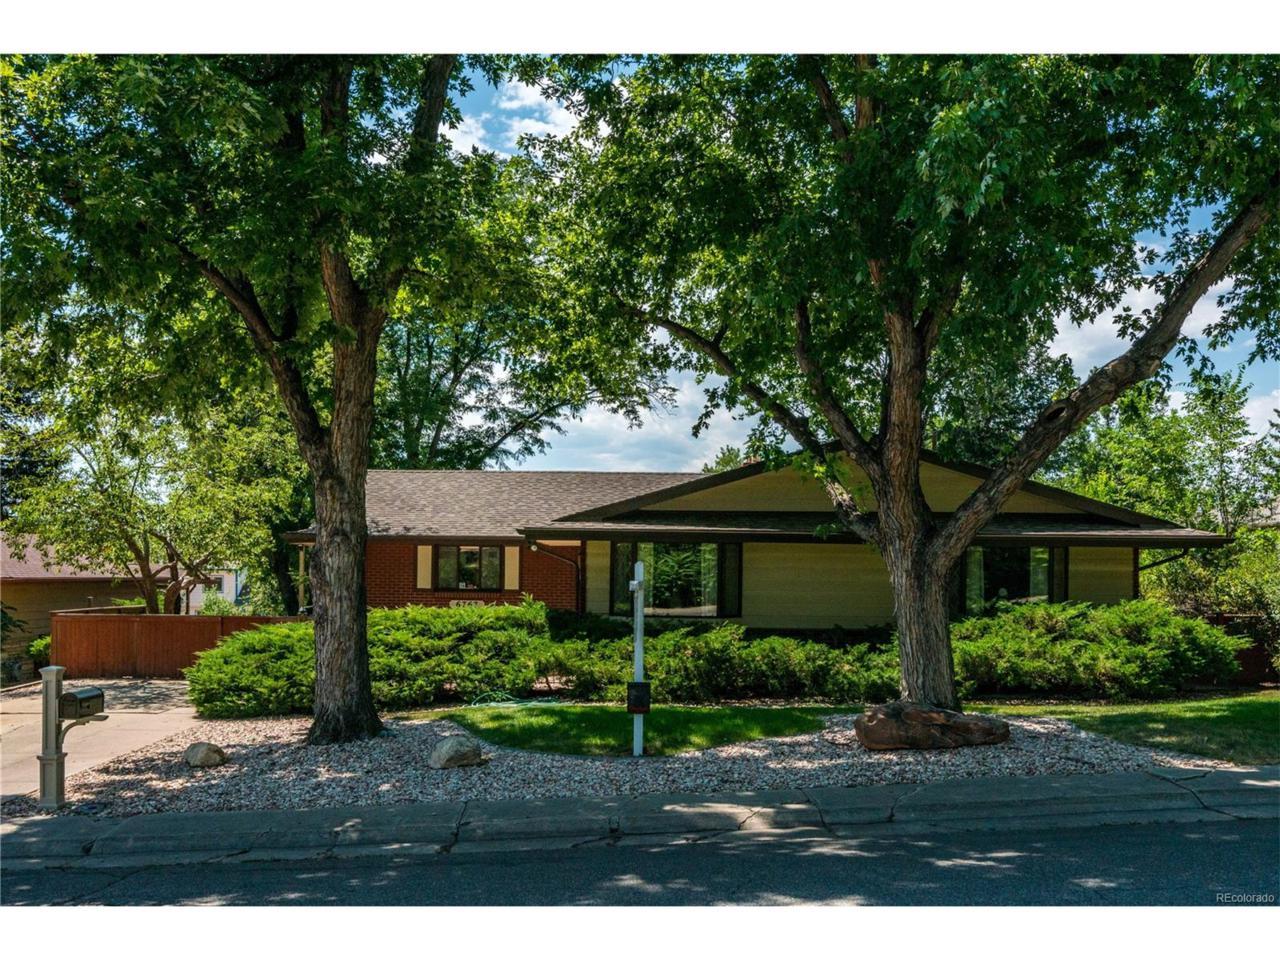 6767 Everett Street, Arvada, CO 80004 (MLS #2446621) :: 8z Real Estate